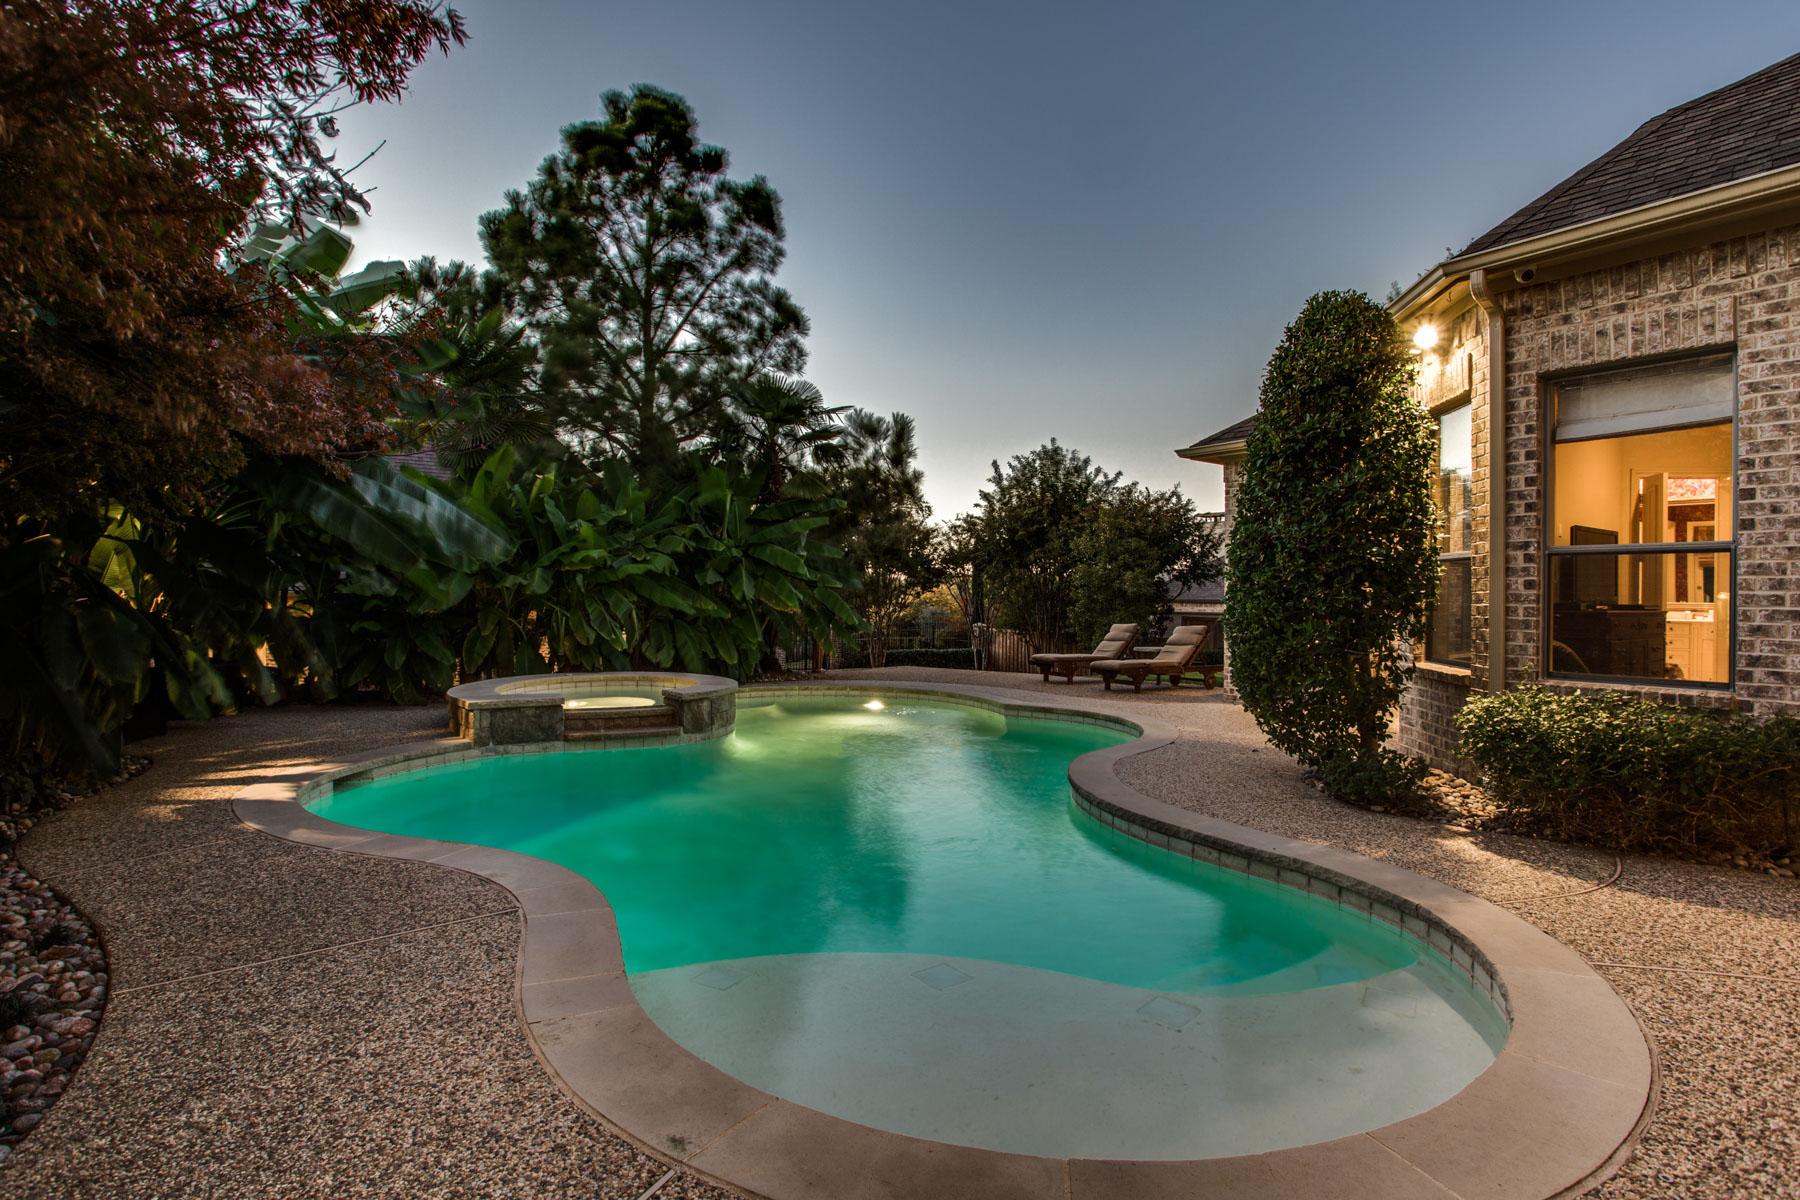 واحد منزل الأسرة للـ Sale في Fabulous Double Lot Home in Shoal Creek 6641 Woodland Hills Ln Plano, Texas, 75024 United States